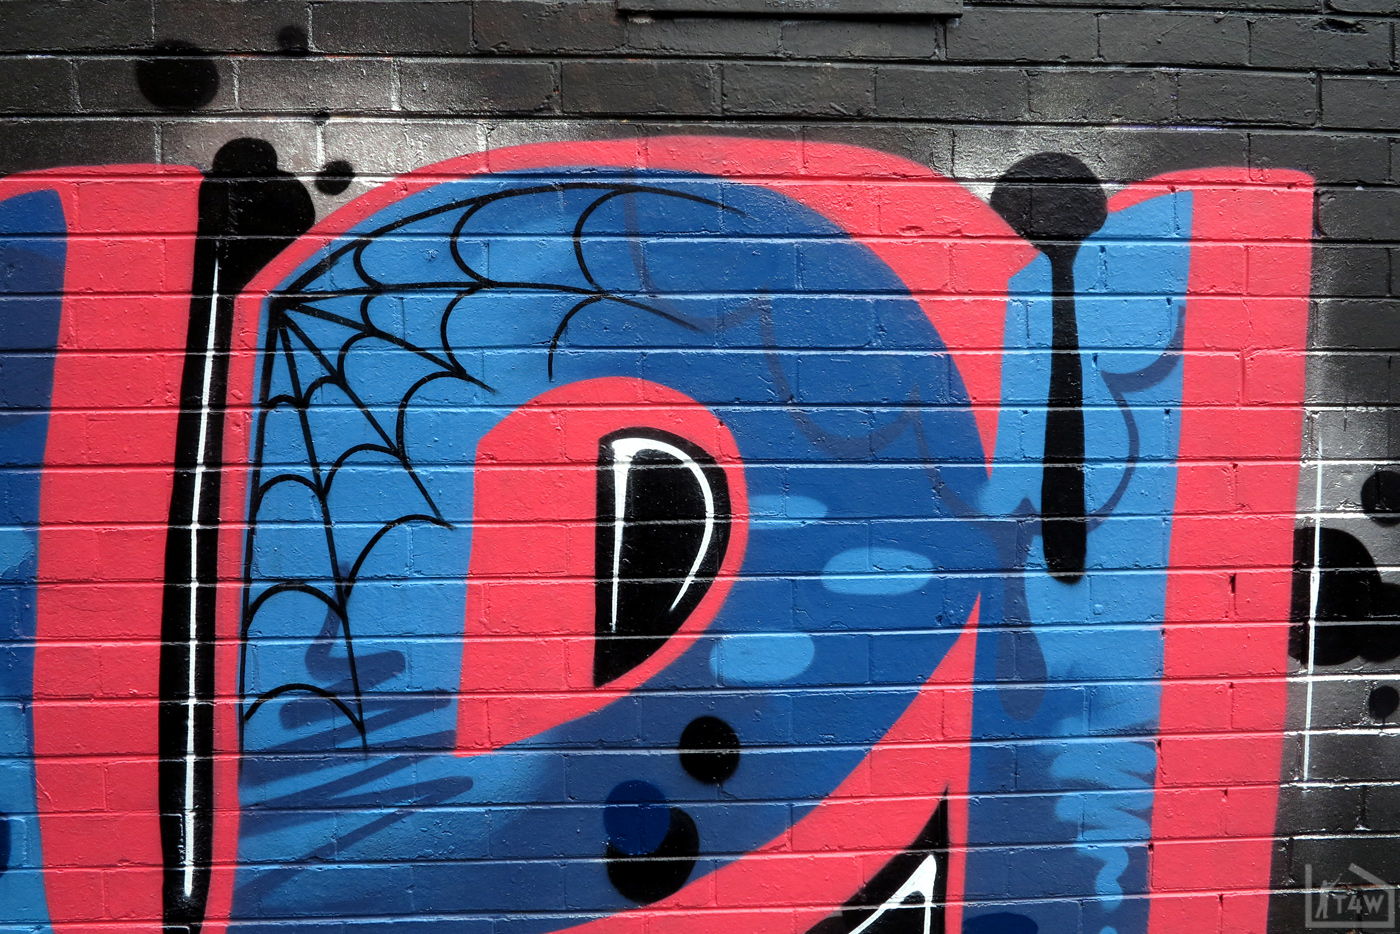 the-fourth-walls-melbourne-graffiti-sup-dvate-petals-daisy-maid-sigs-sabeth-pornograffixxx-fitzroy2